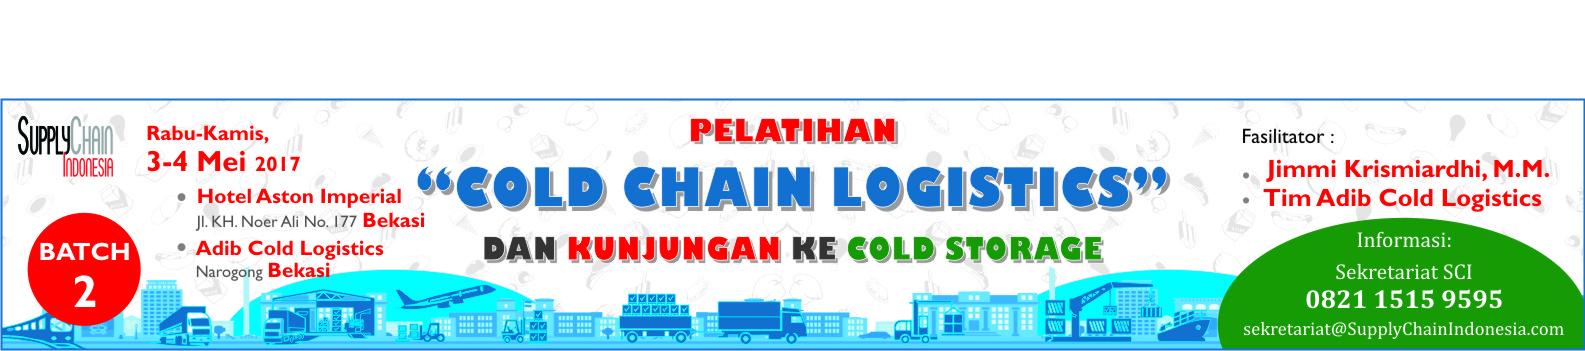 Web-Banner-Pelatihan-Cold-Chain-Batch-II-27-03-2017